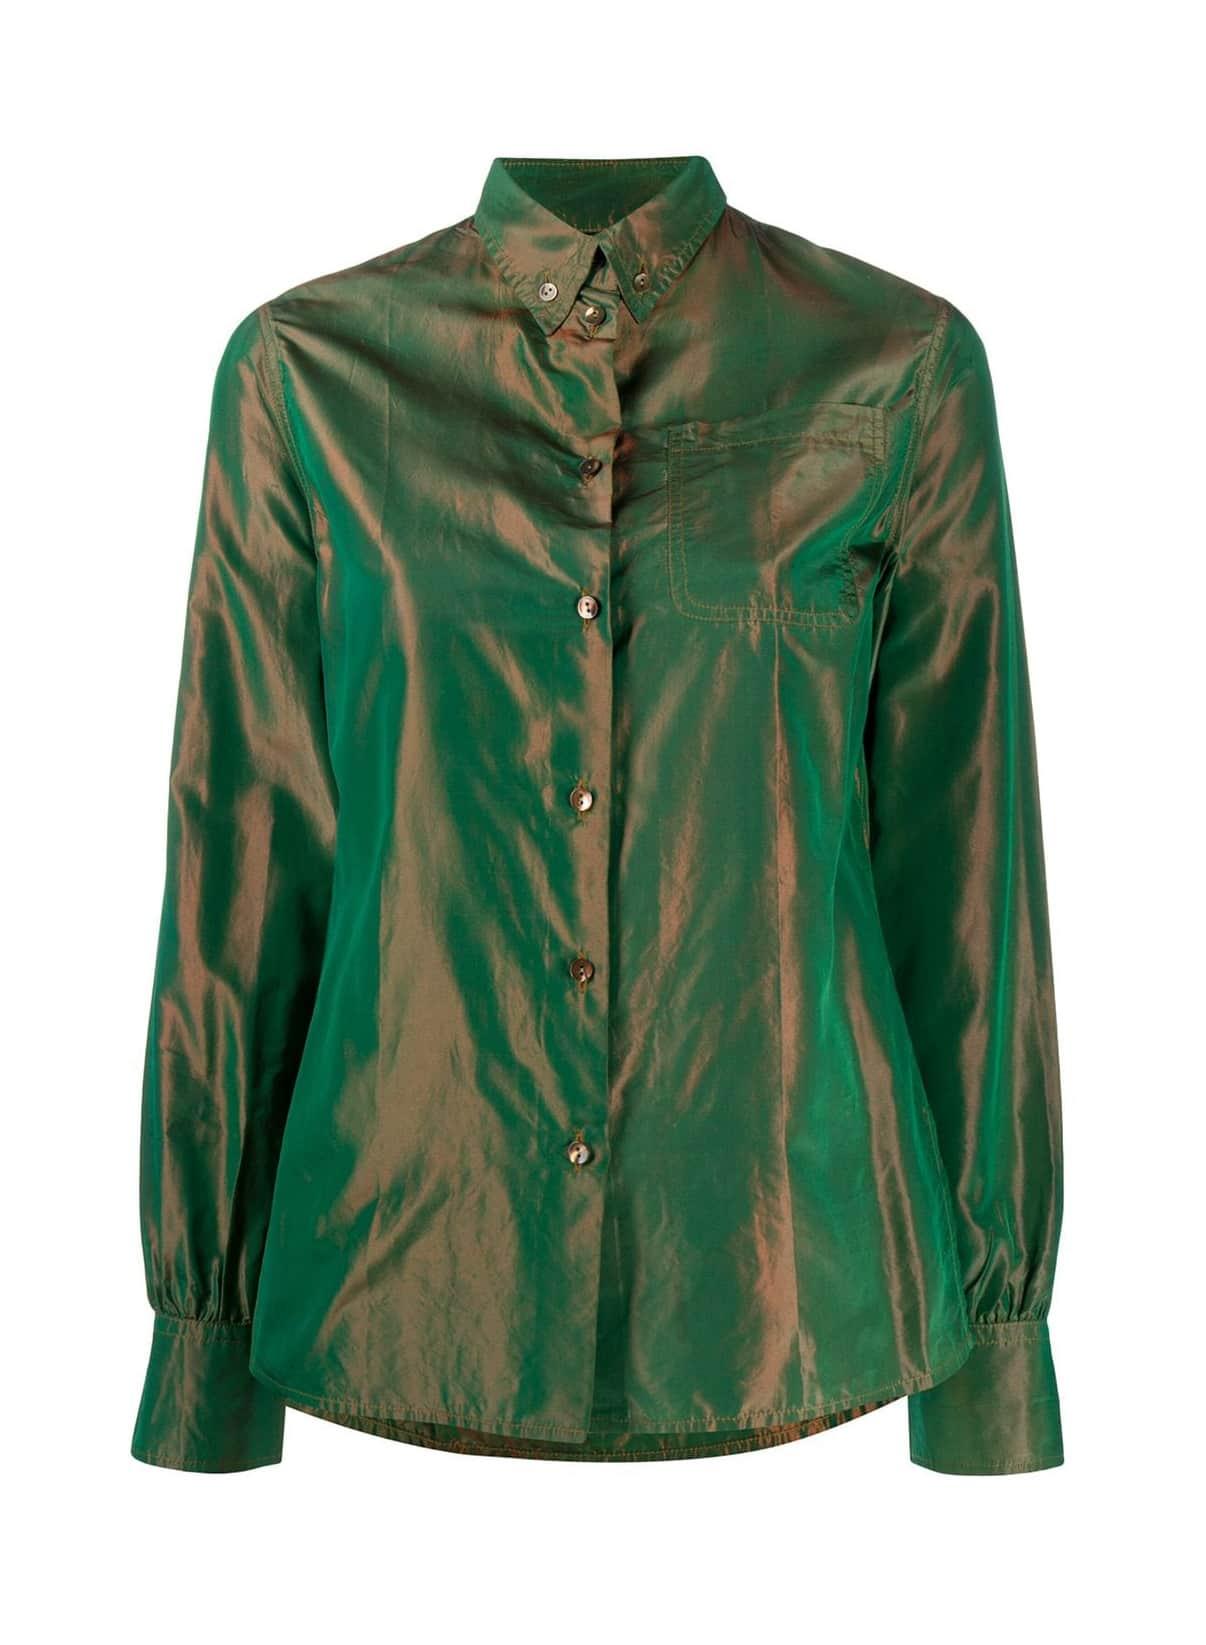 Jean Paul Gaultier Pre-Owned 1990s Iridescent Effect button-down Shirt - Farfetch